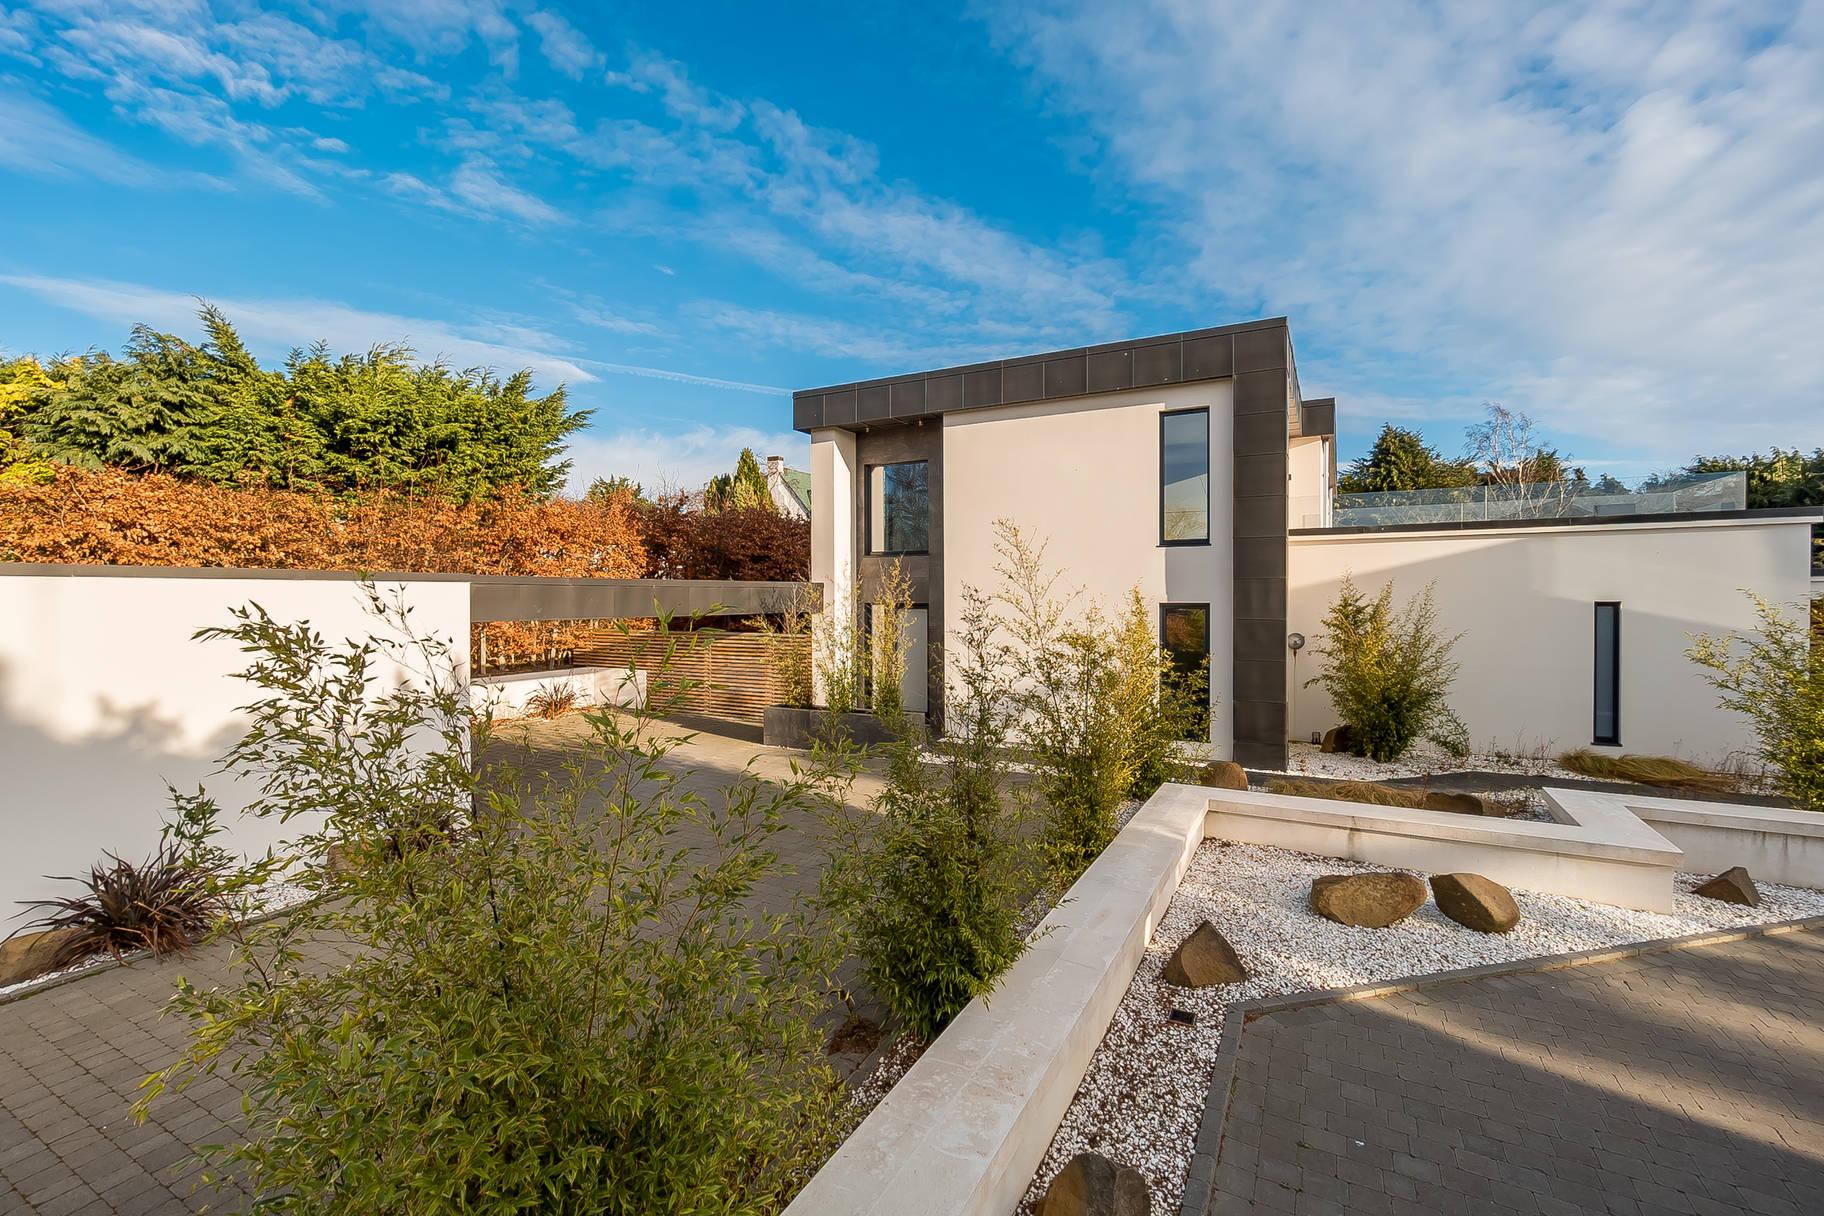 Shiro House, 108 Cammo Grove, Edinburgh, EH4 8HD